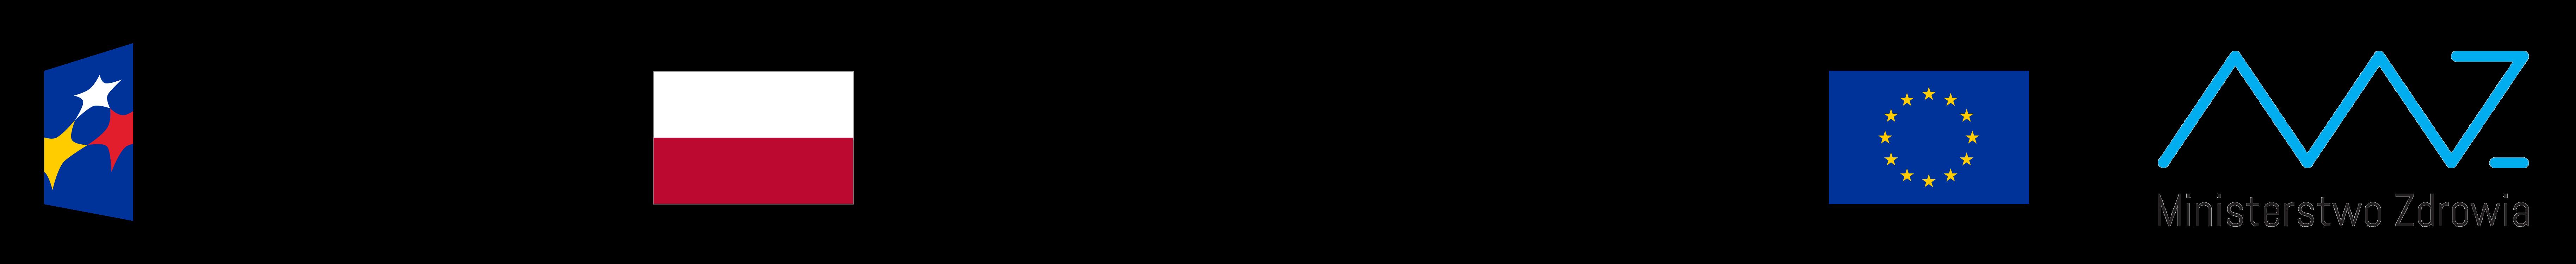 Logo: UE - Polska - Ministerstwo Zdrowia (V)